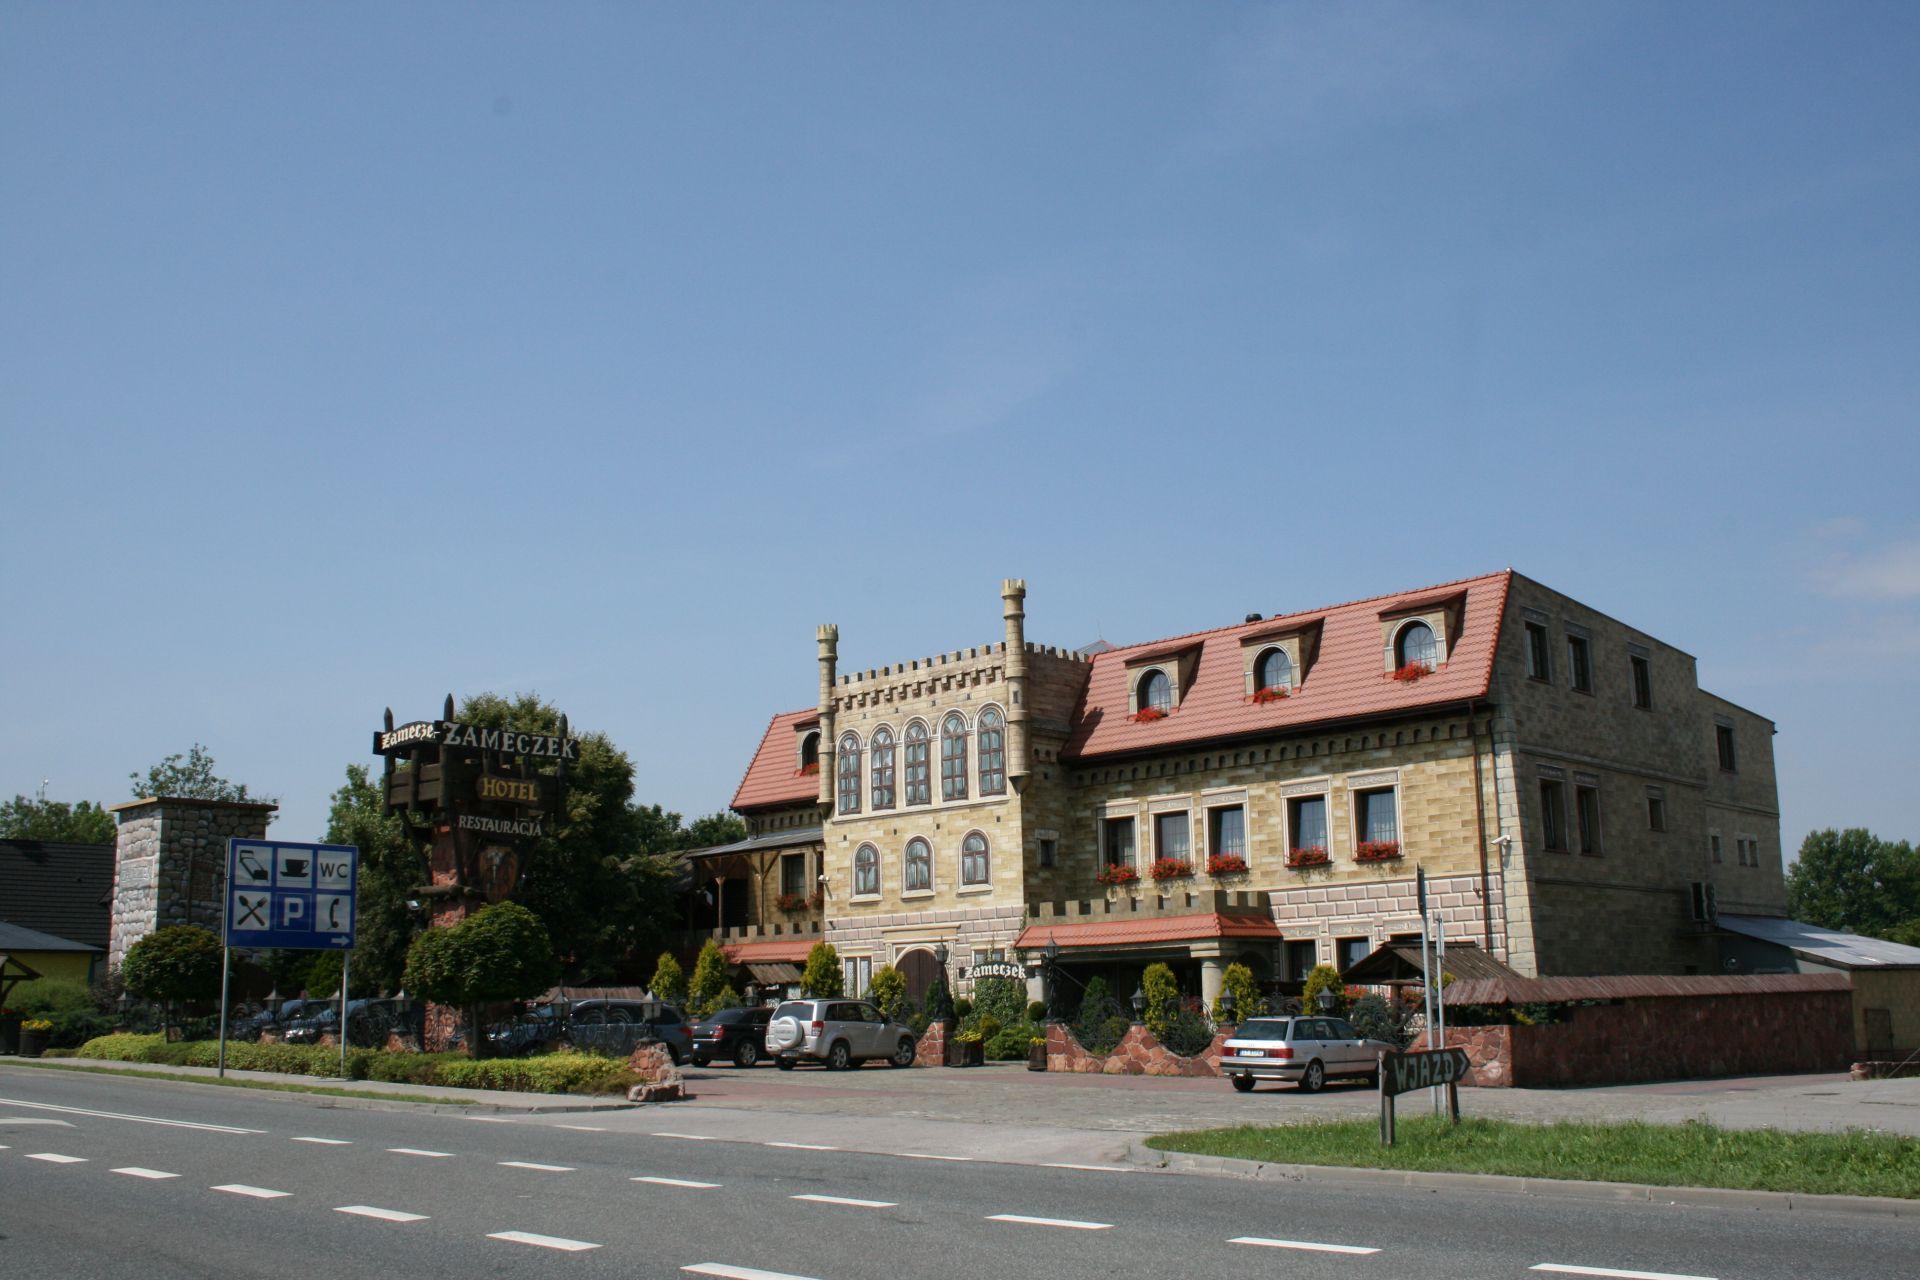 Hotel Zameczek